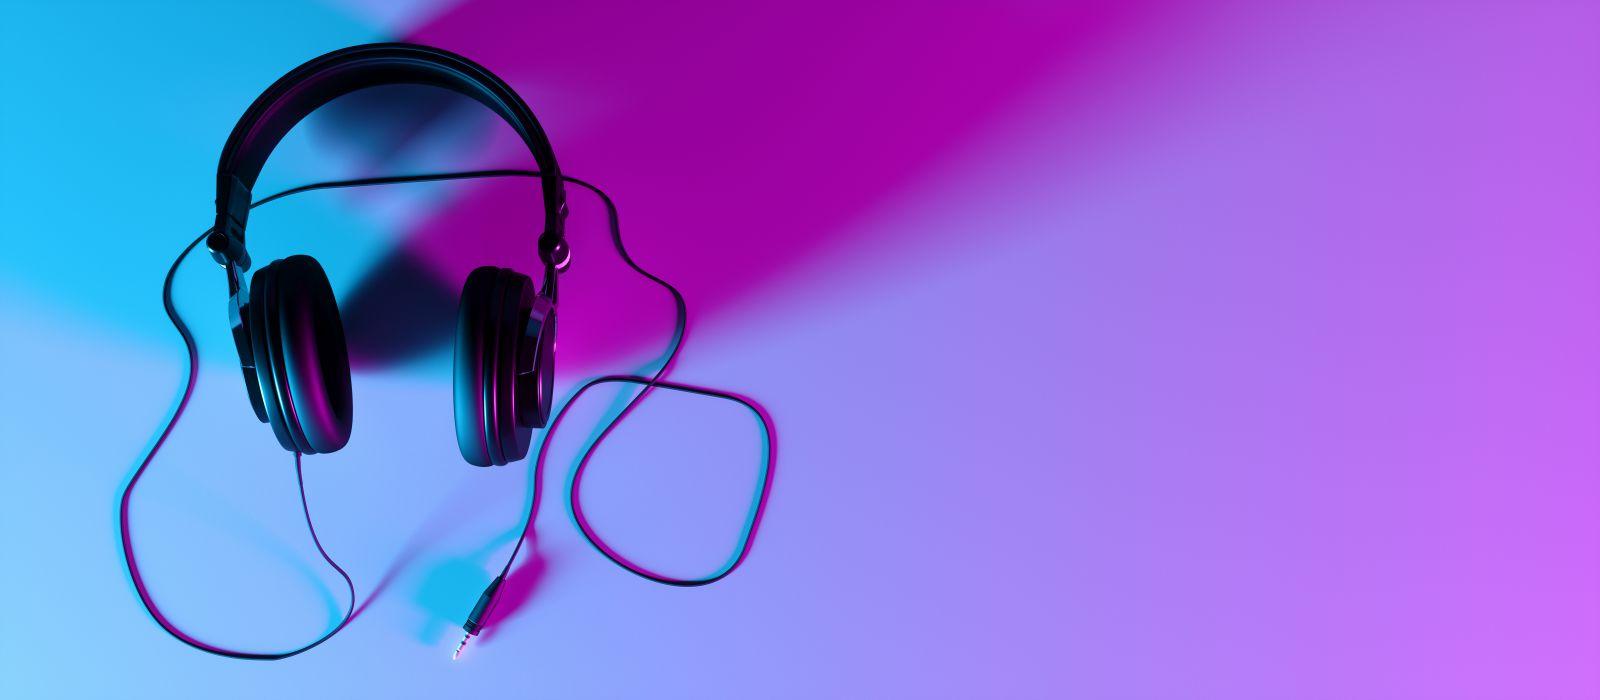 Black wired headphones on a magenta lit white desk